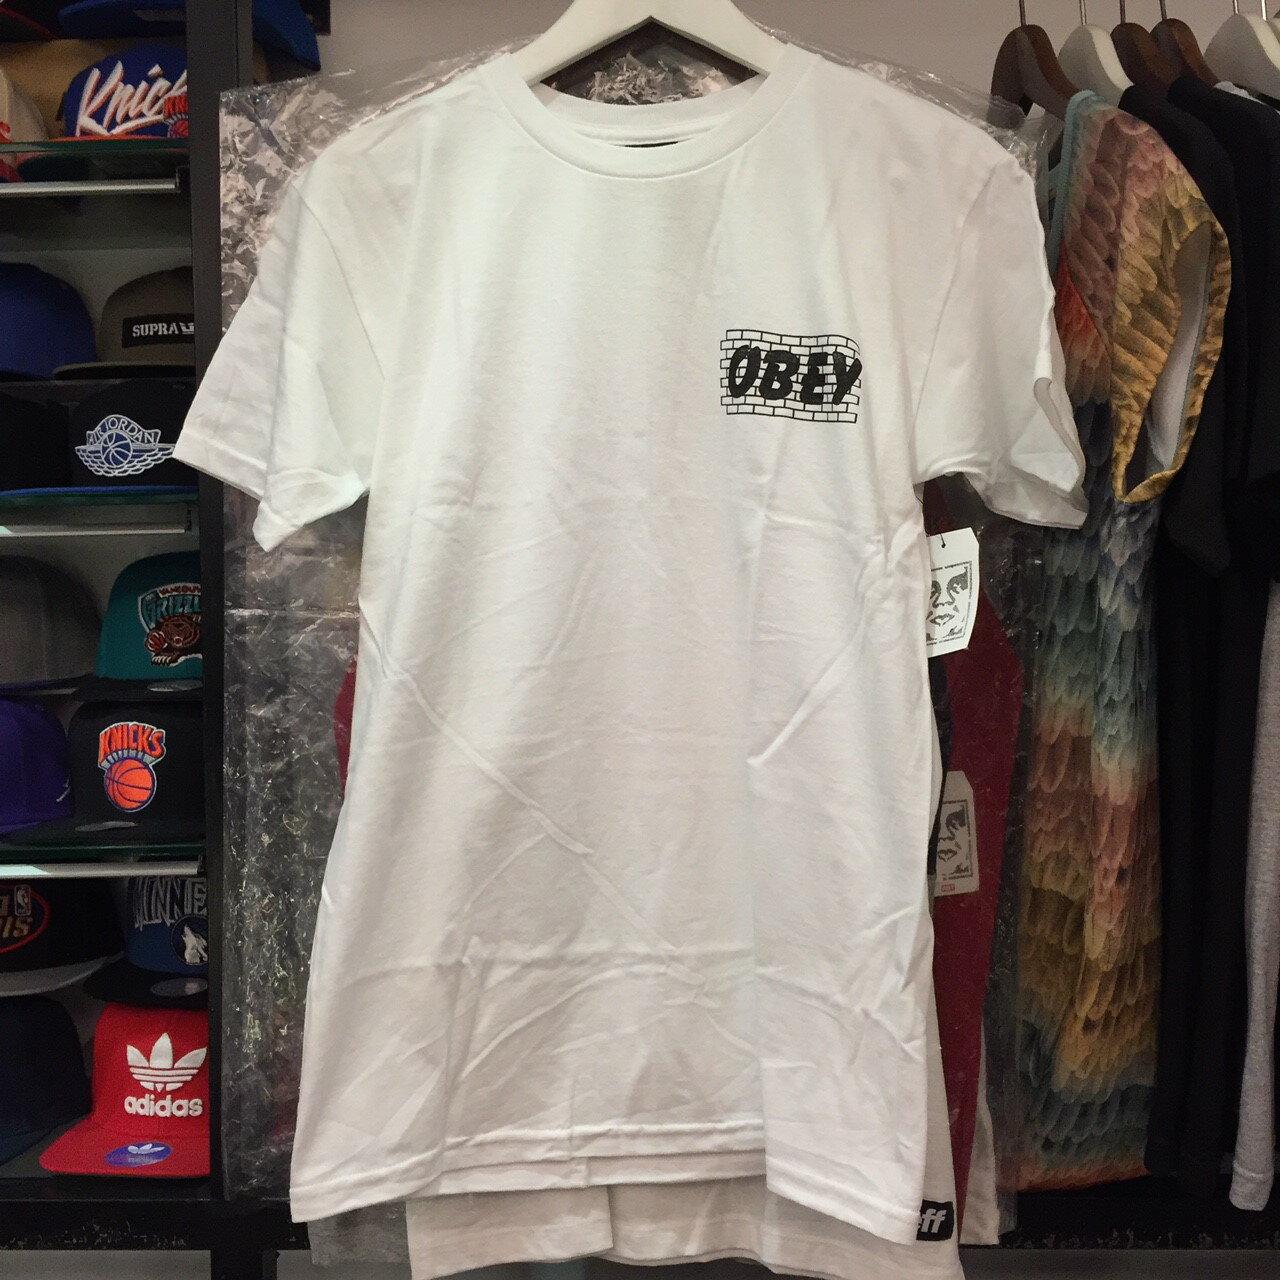 BEETLE PLUS 西門町經銷 全新 美國品牌 OBEY BRICK WALL TEE 磚牆 全白 黑字 白字 LOGO 短 TEE 163081179WHT OB-420 0